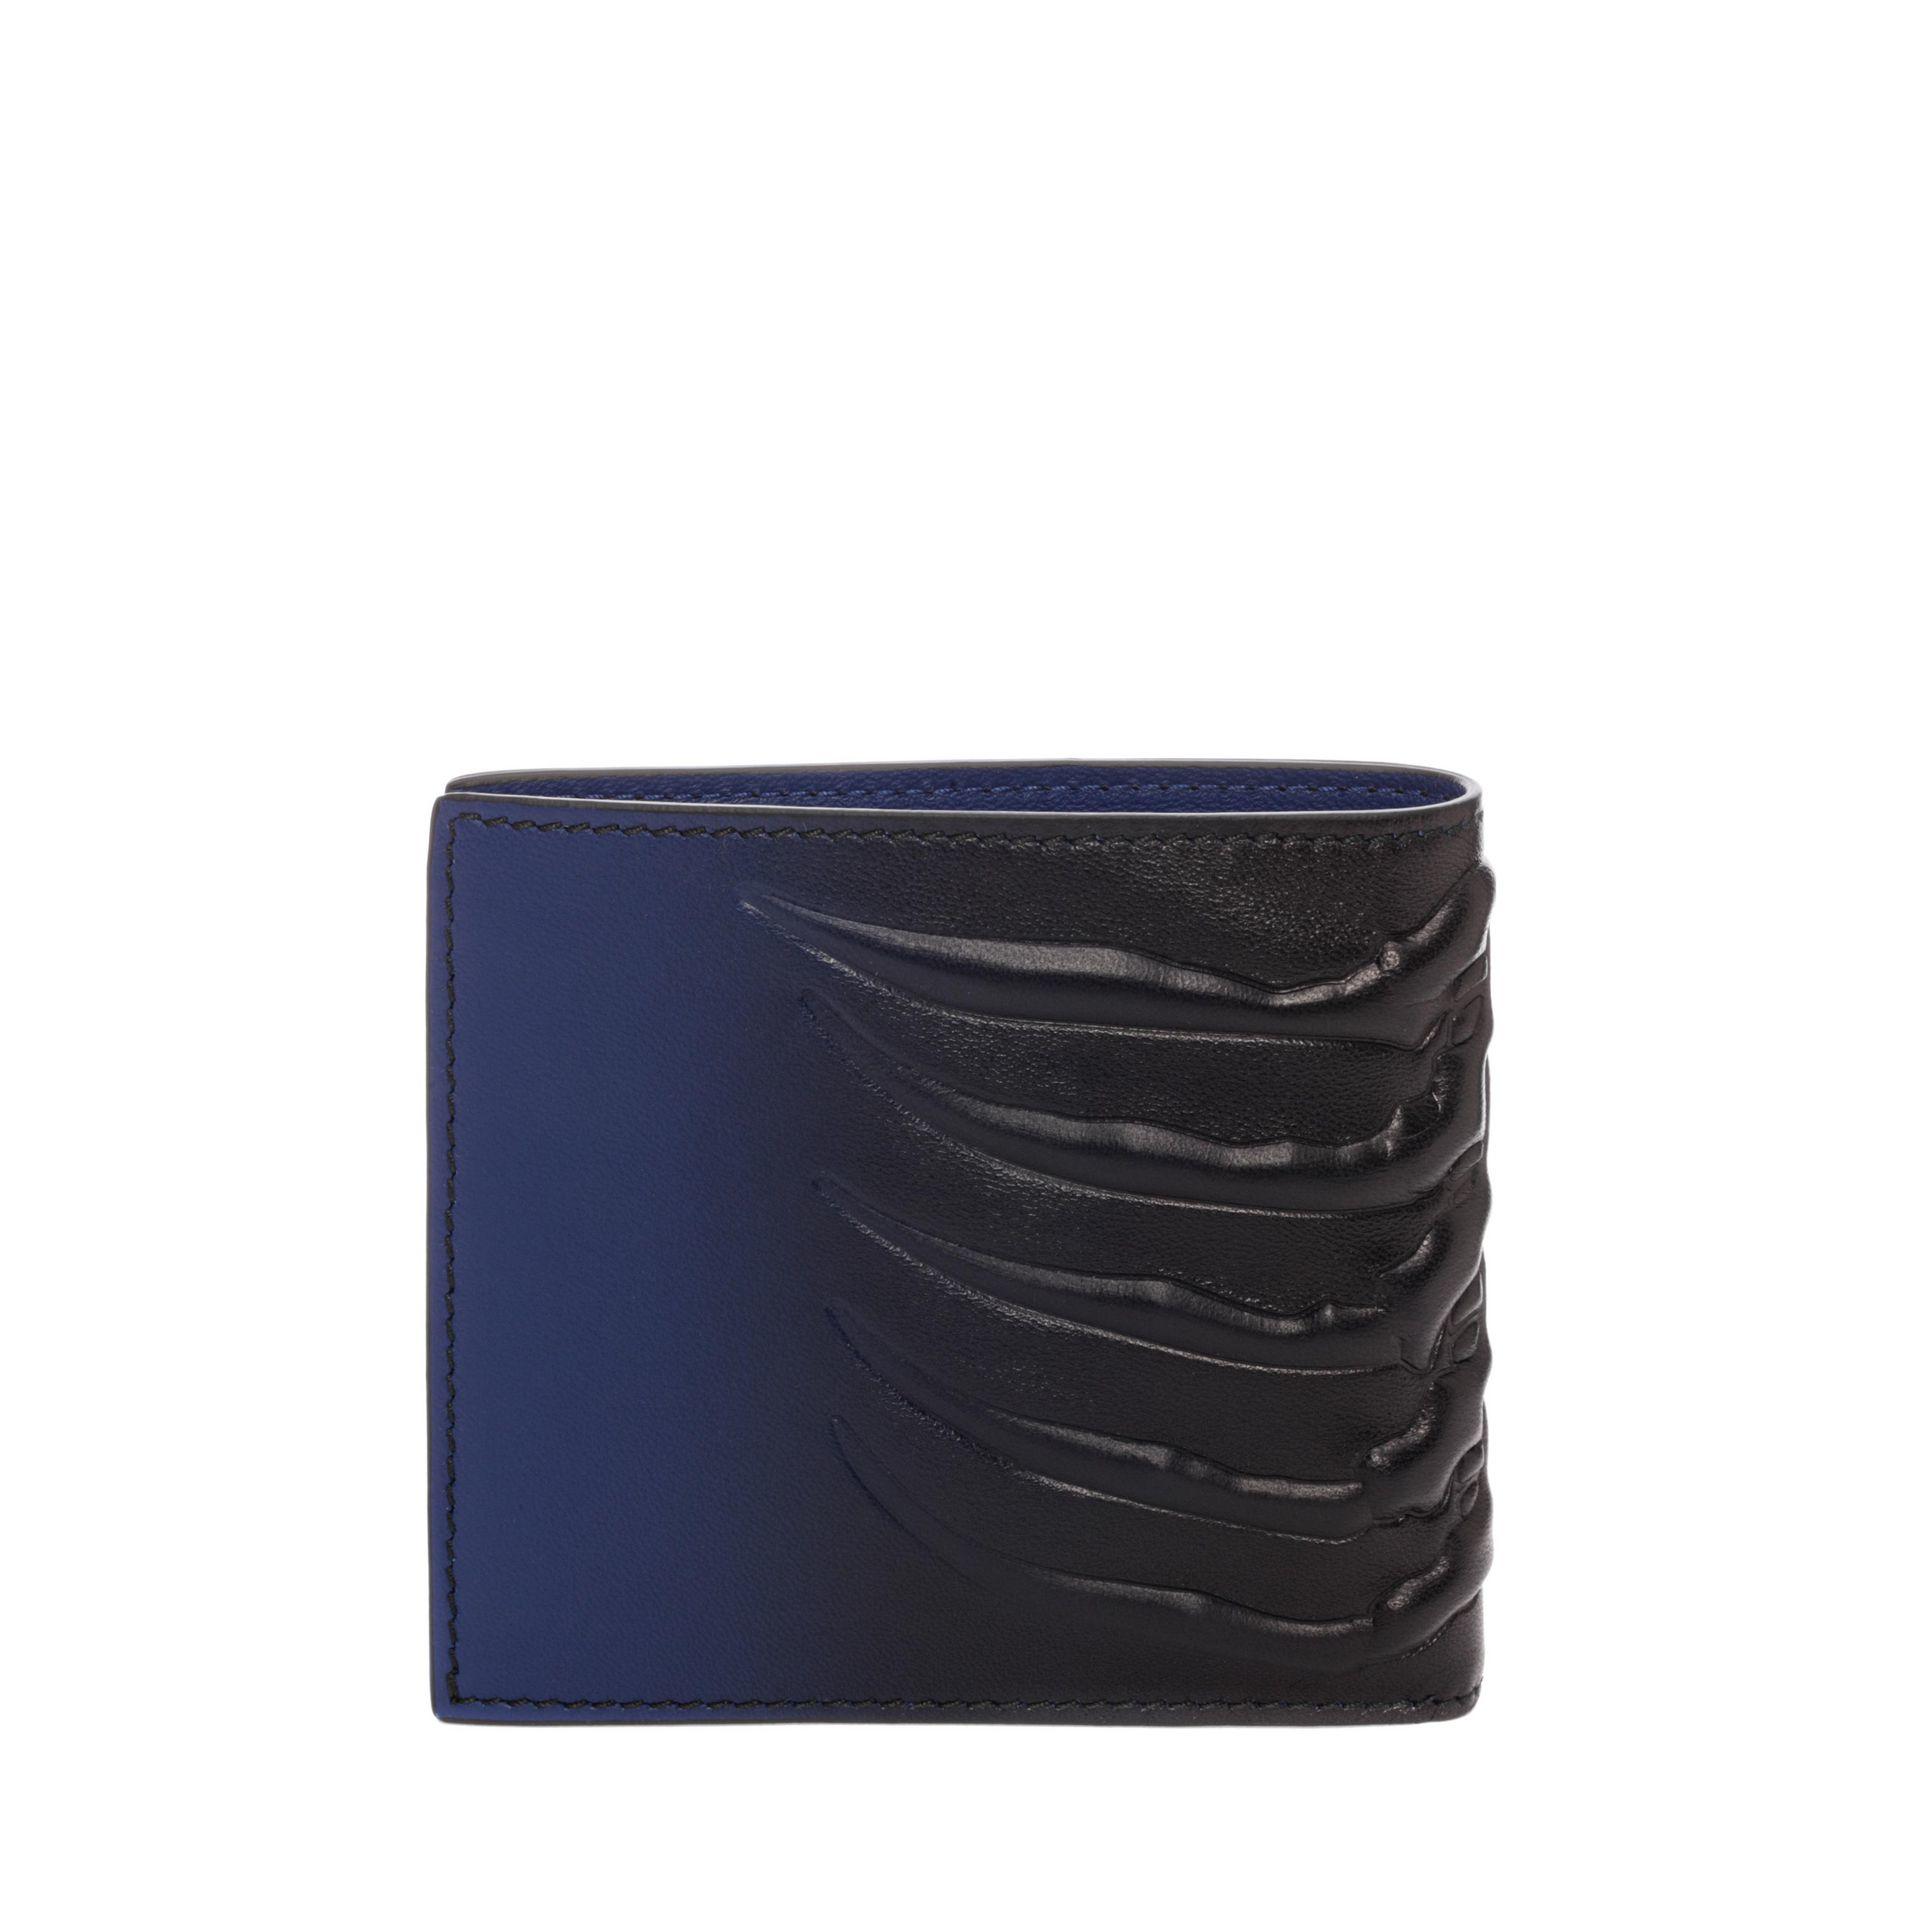 Alexander Mcqueen Leather Billfold Wallet In Ultramarine